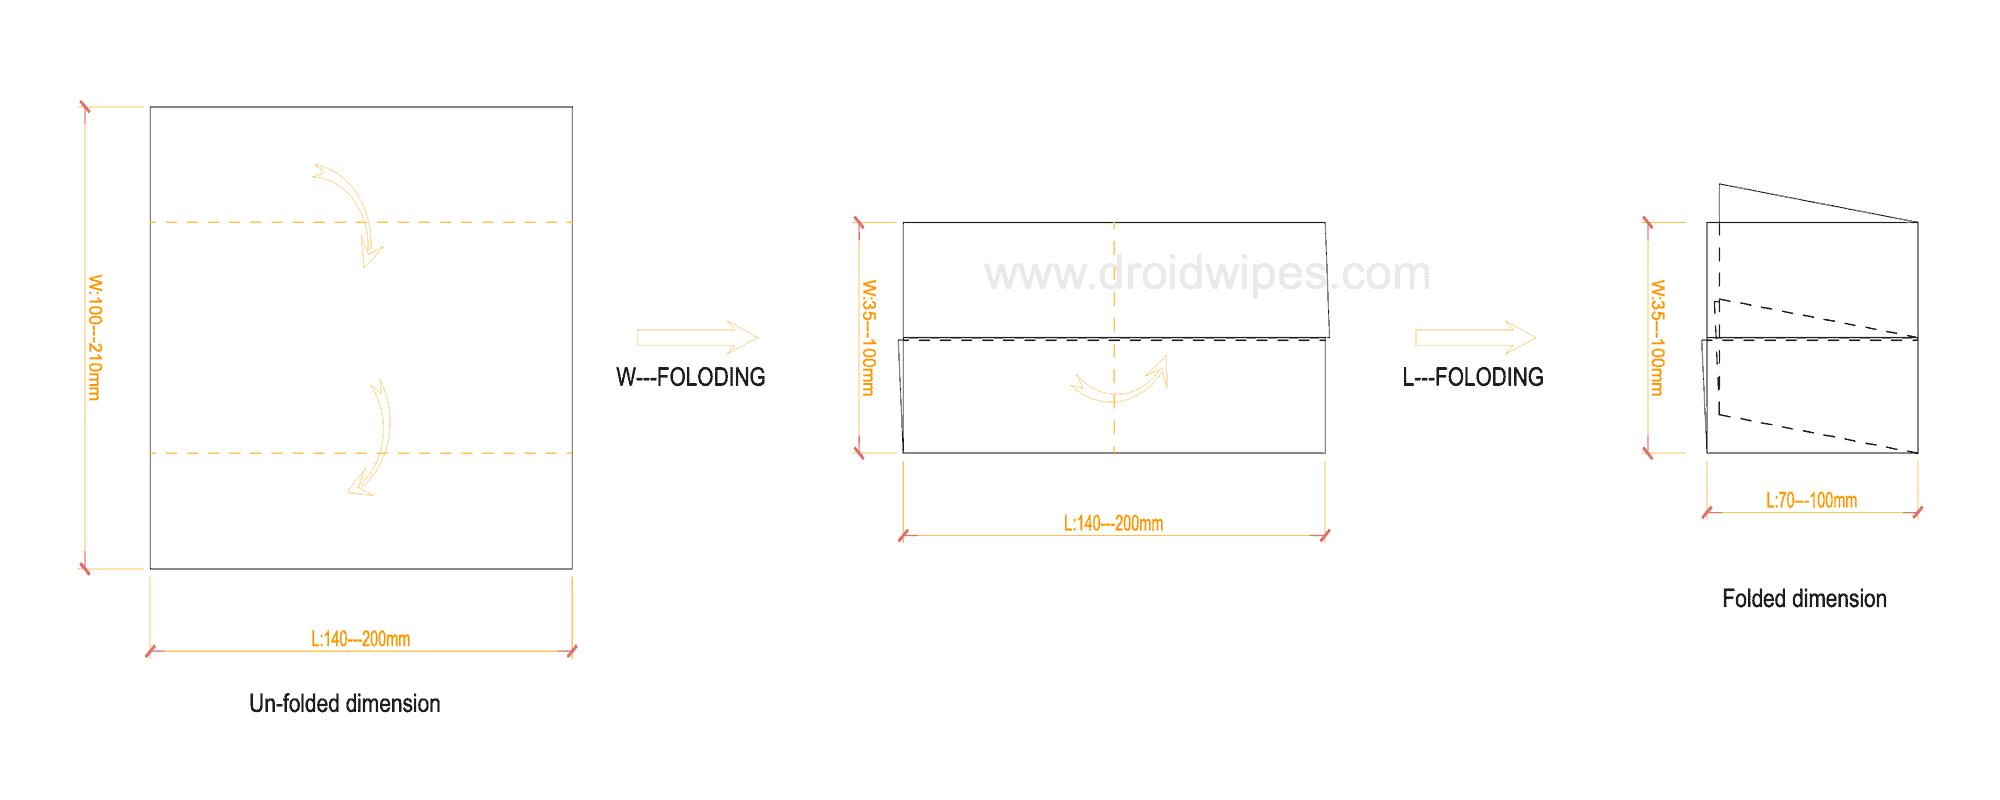 0001wet wipes machine - UT-FL4 Cross fold Wet Wipes Machine (5-40Wipes/pack)